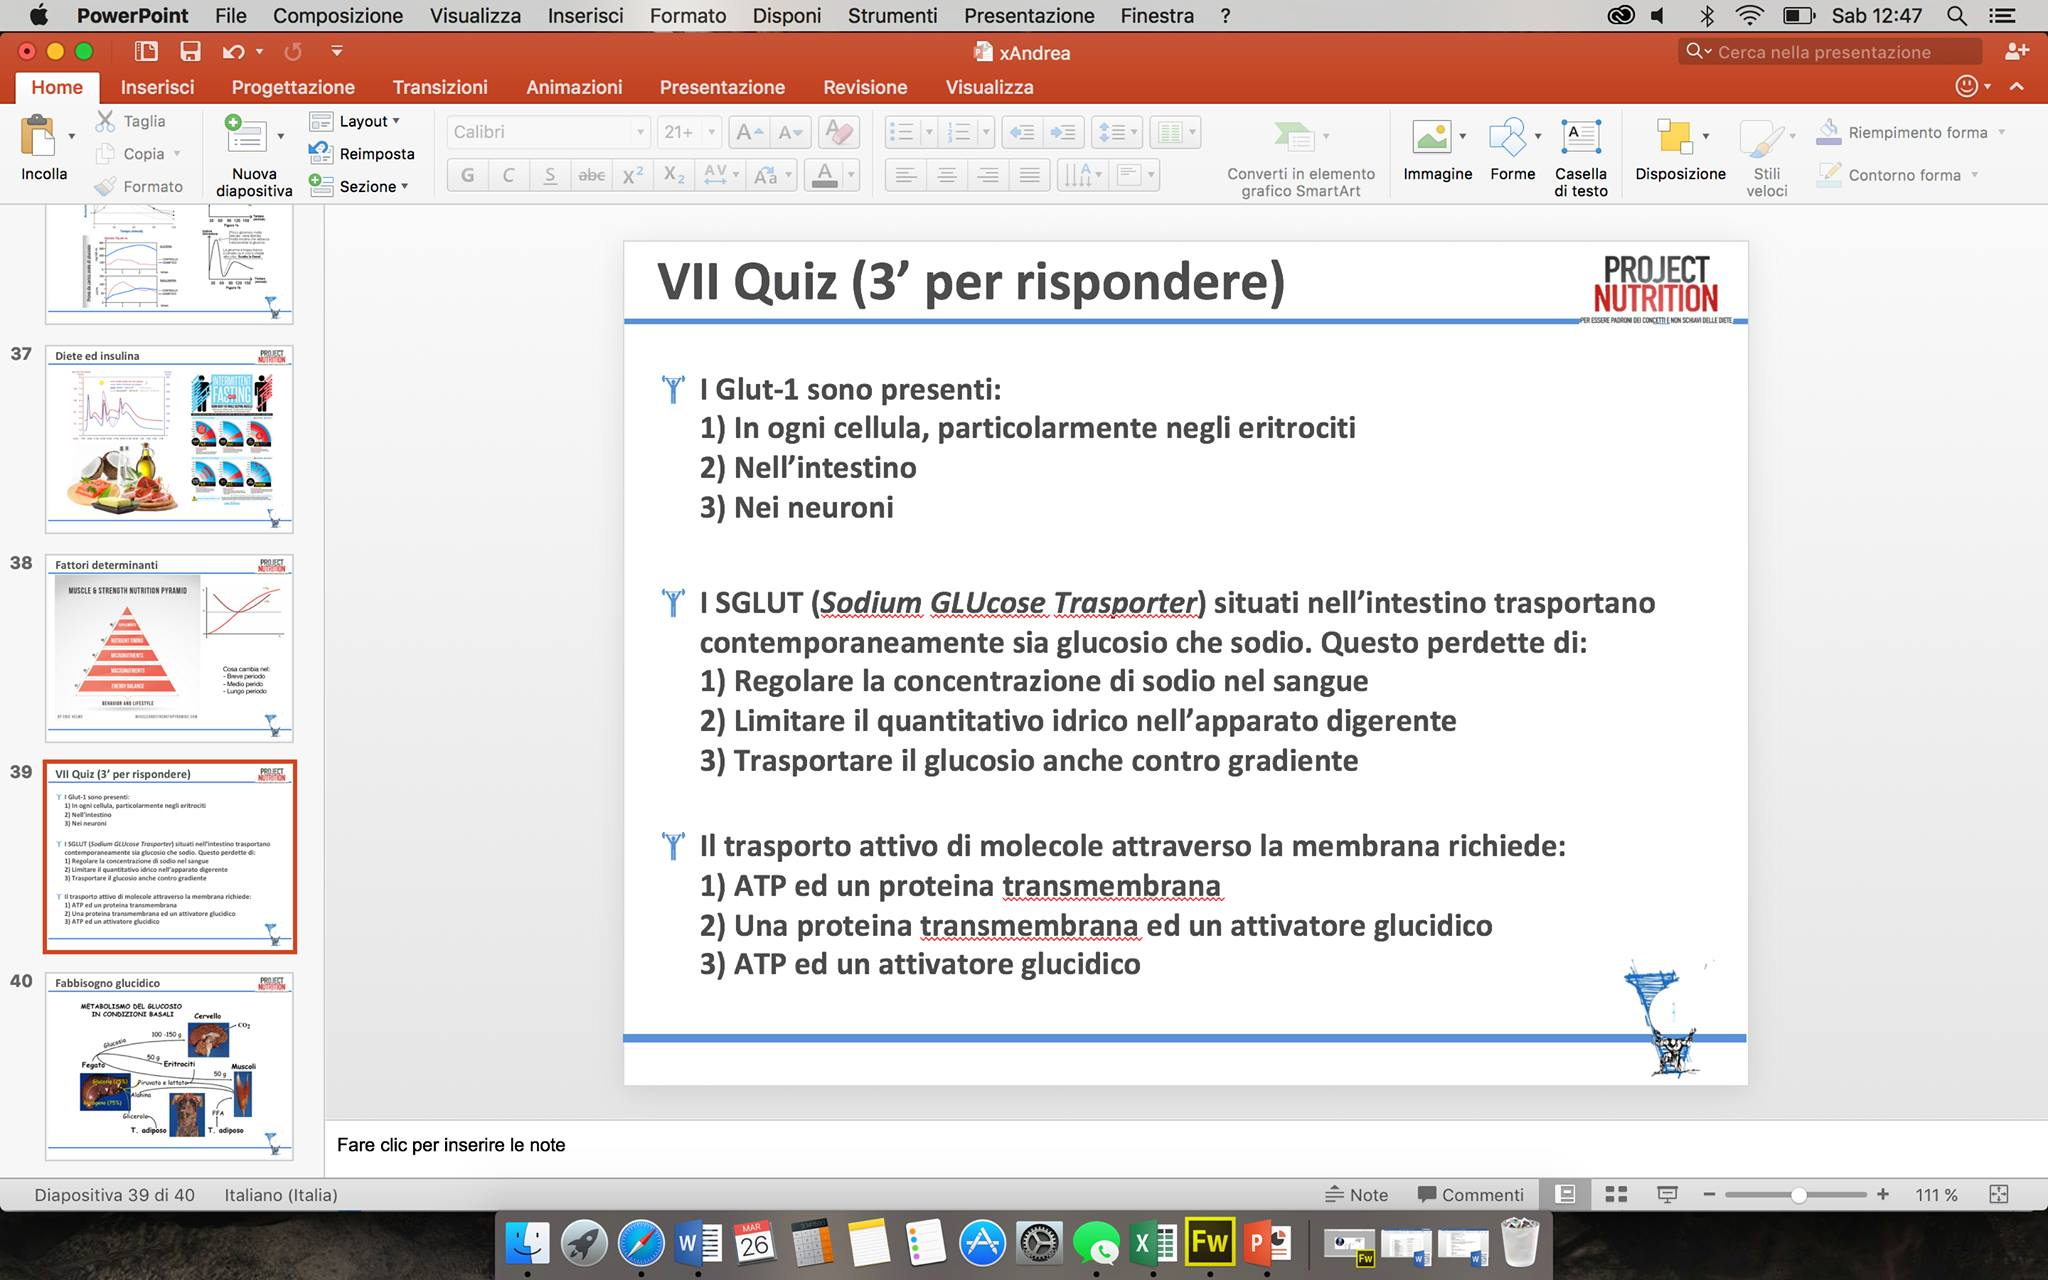 Slide project nutrition